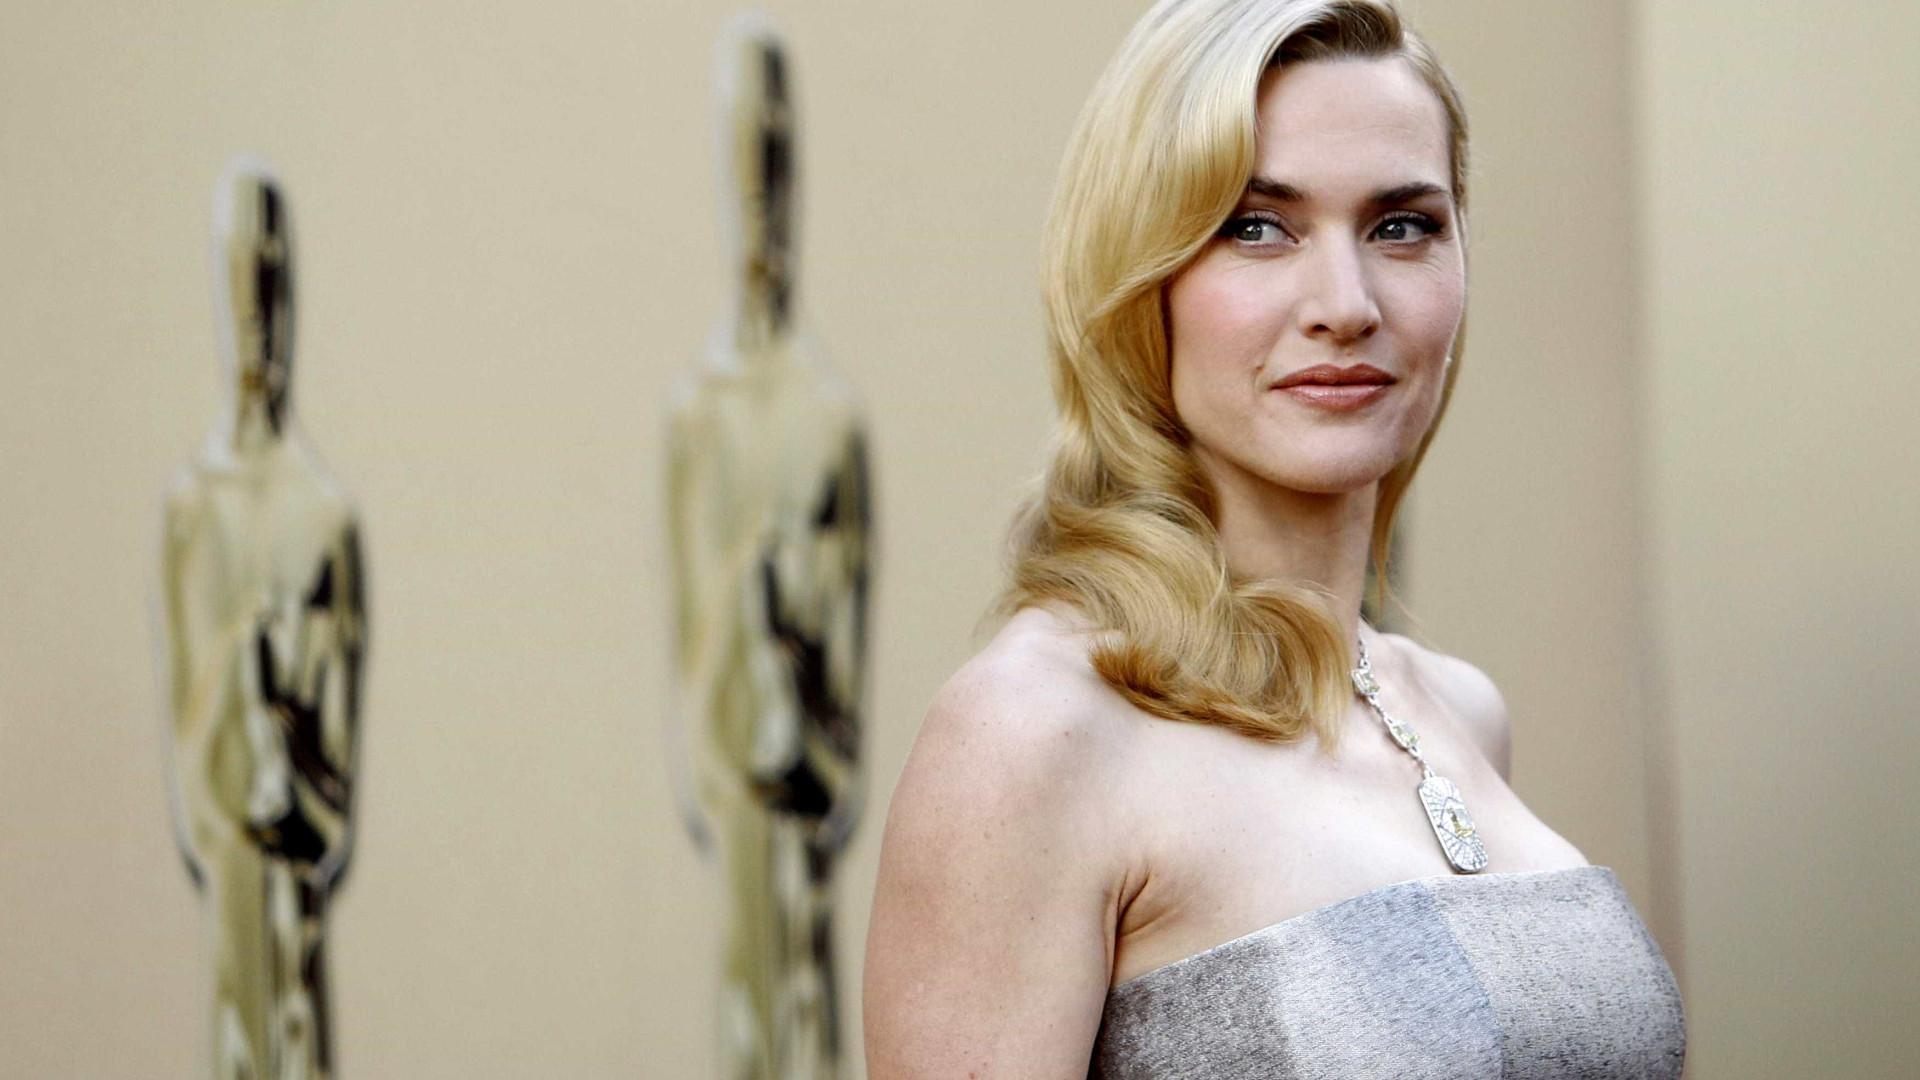 Kate Winslet gera polémica ao elogiar Woody Allen